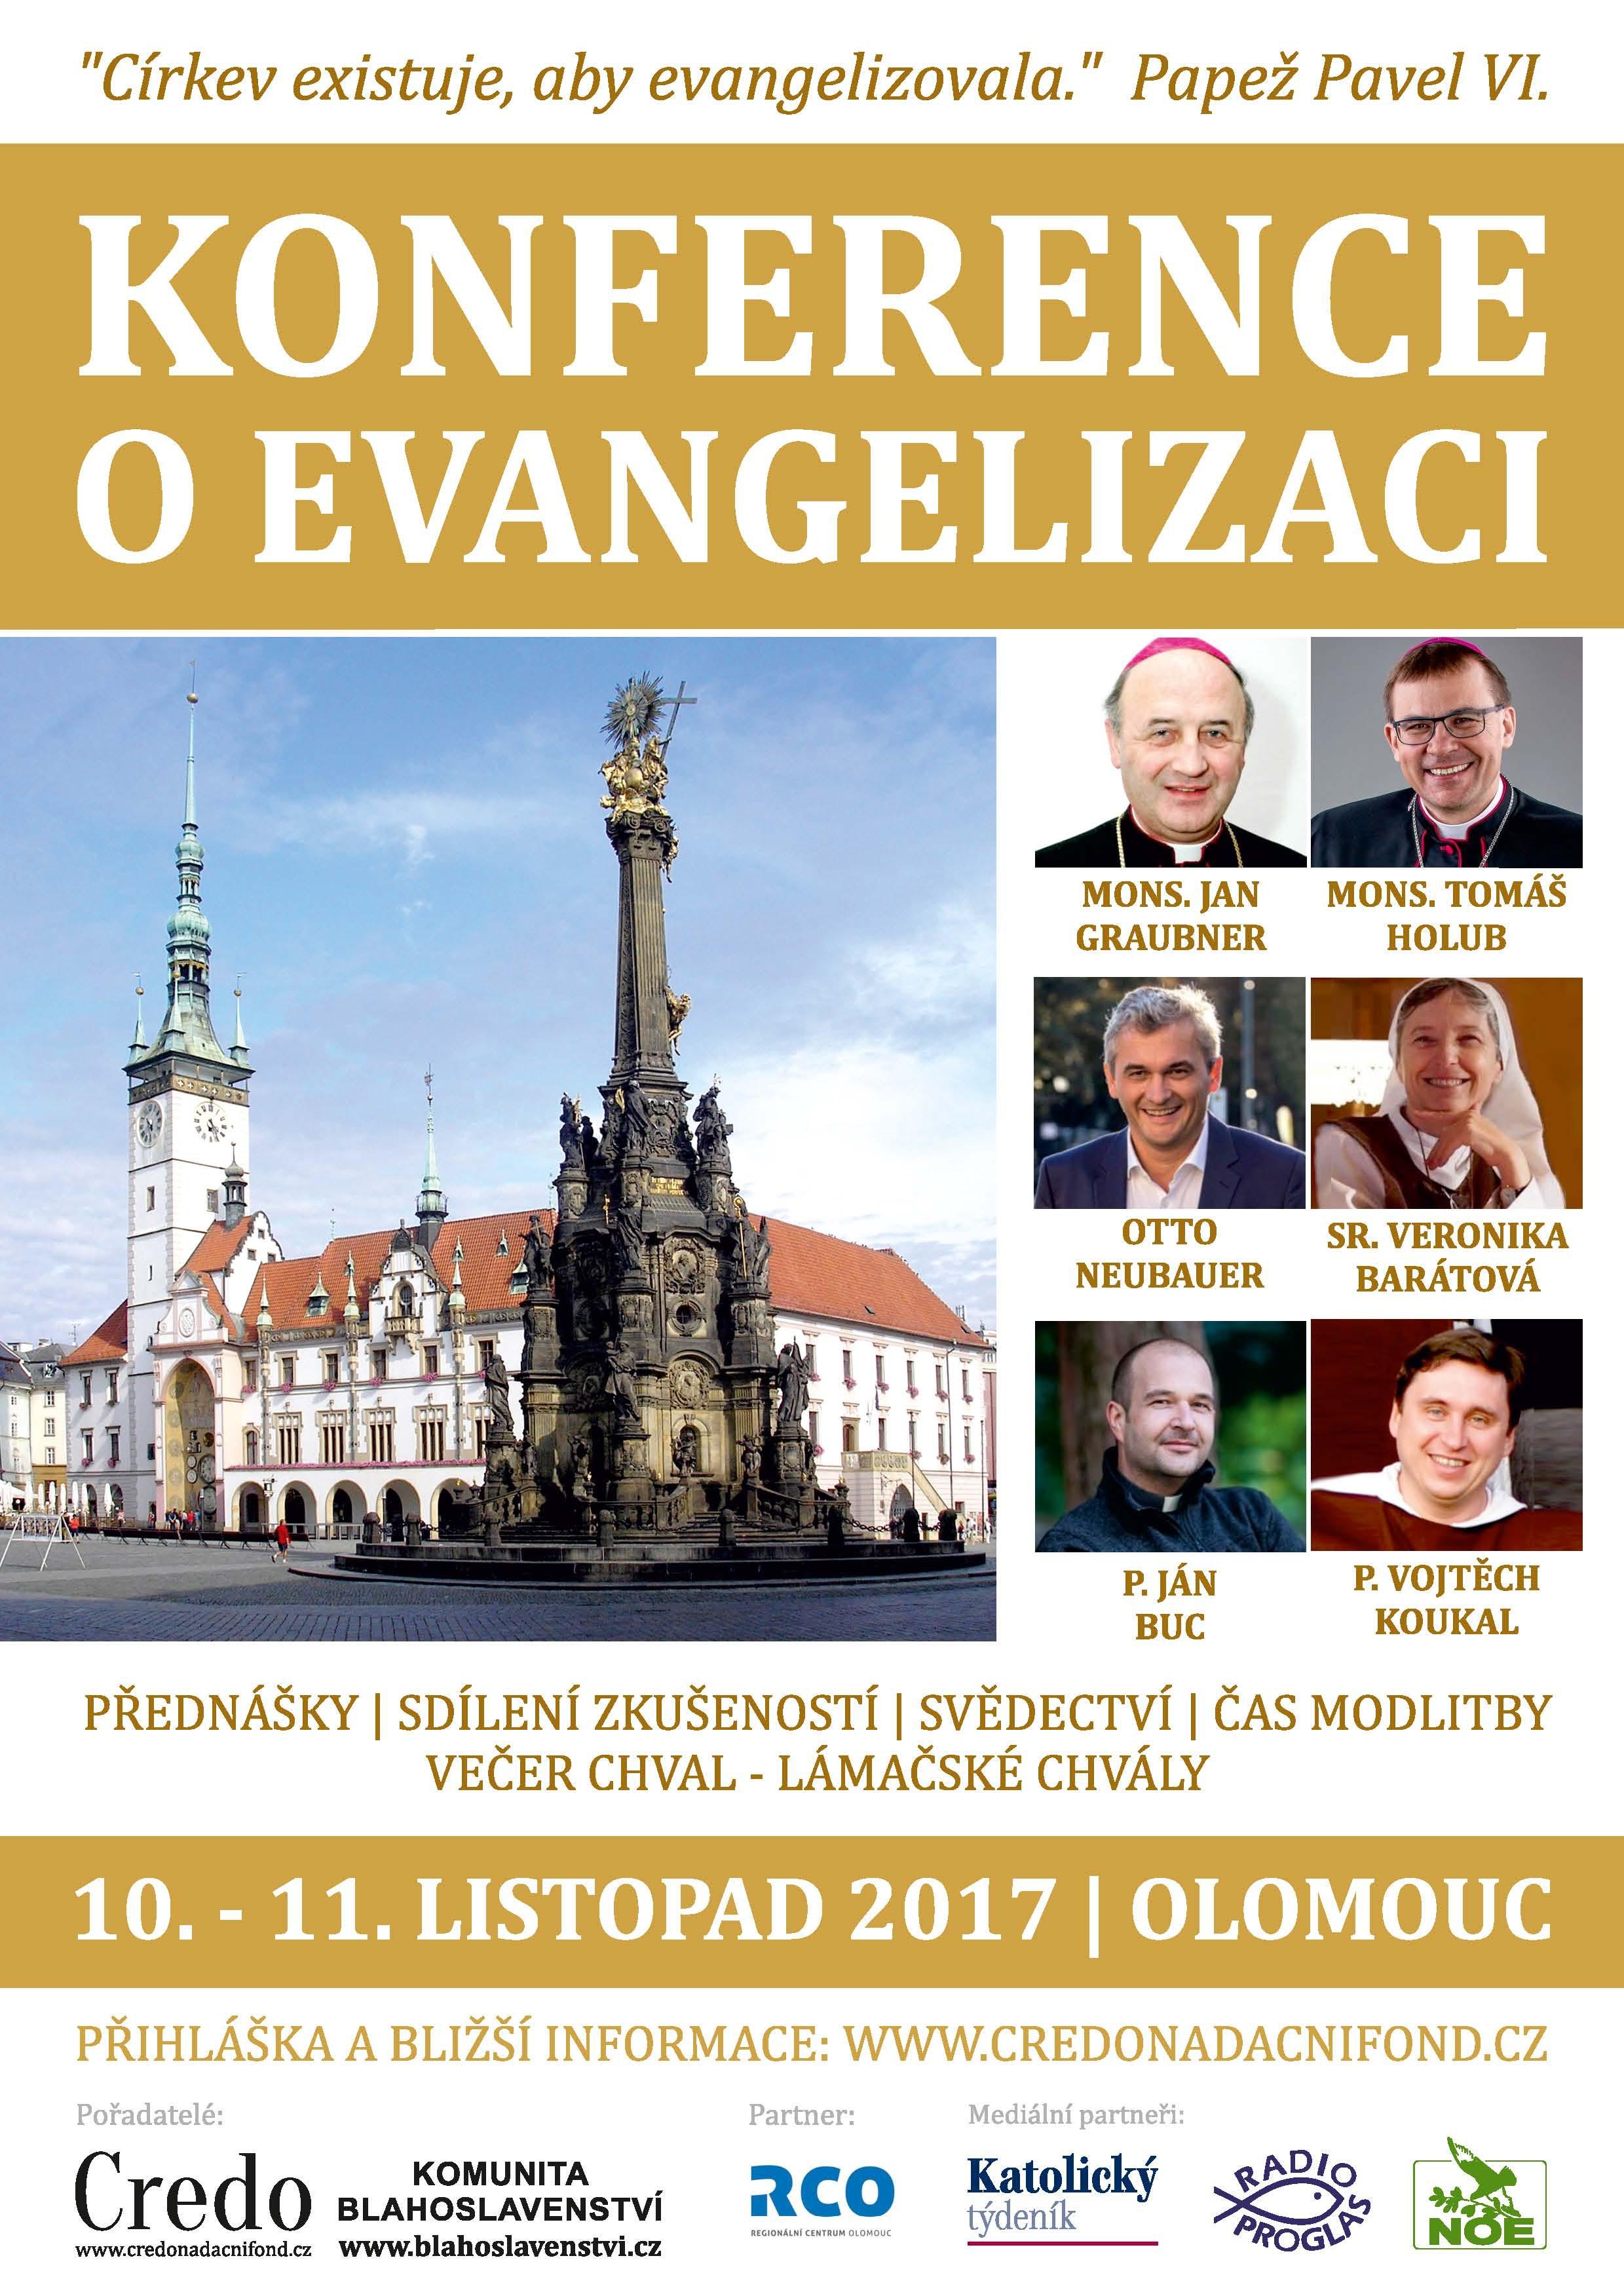 konference o evangelizaci Olomouc -  A4